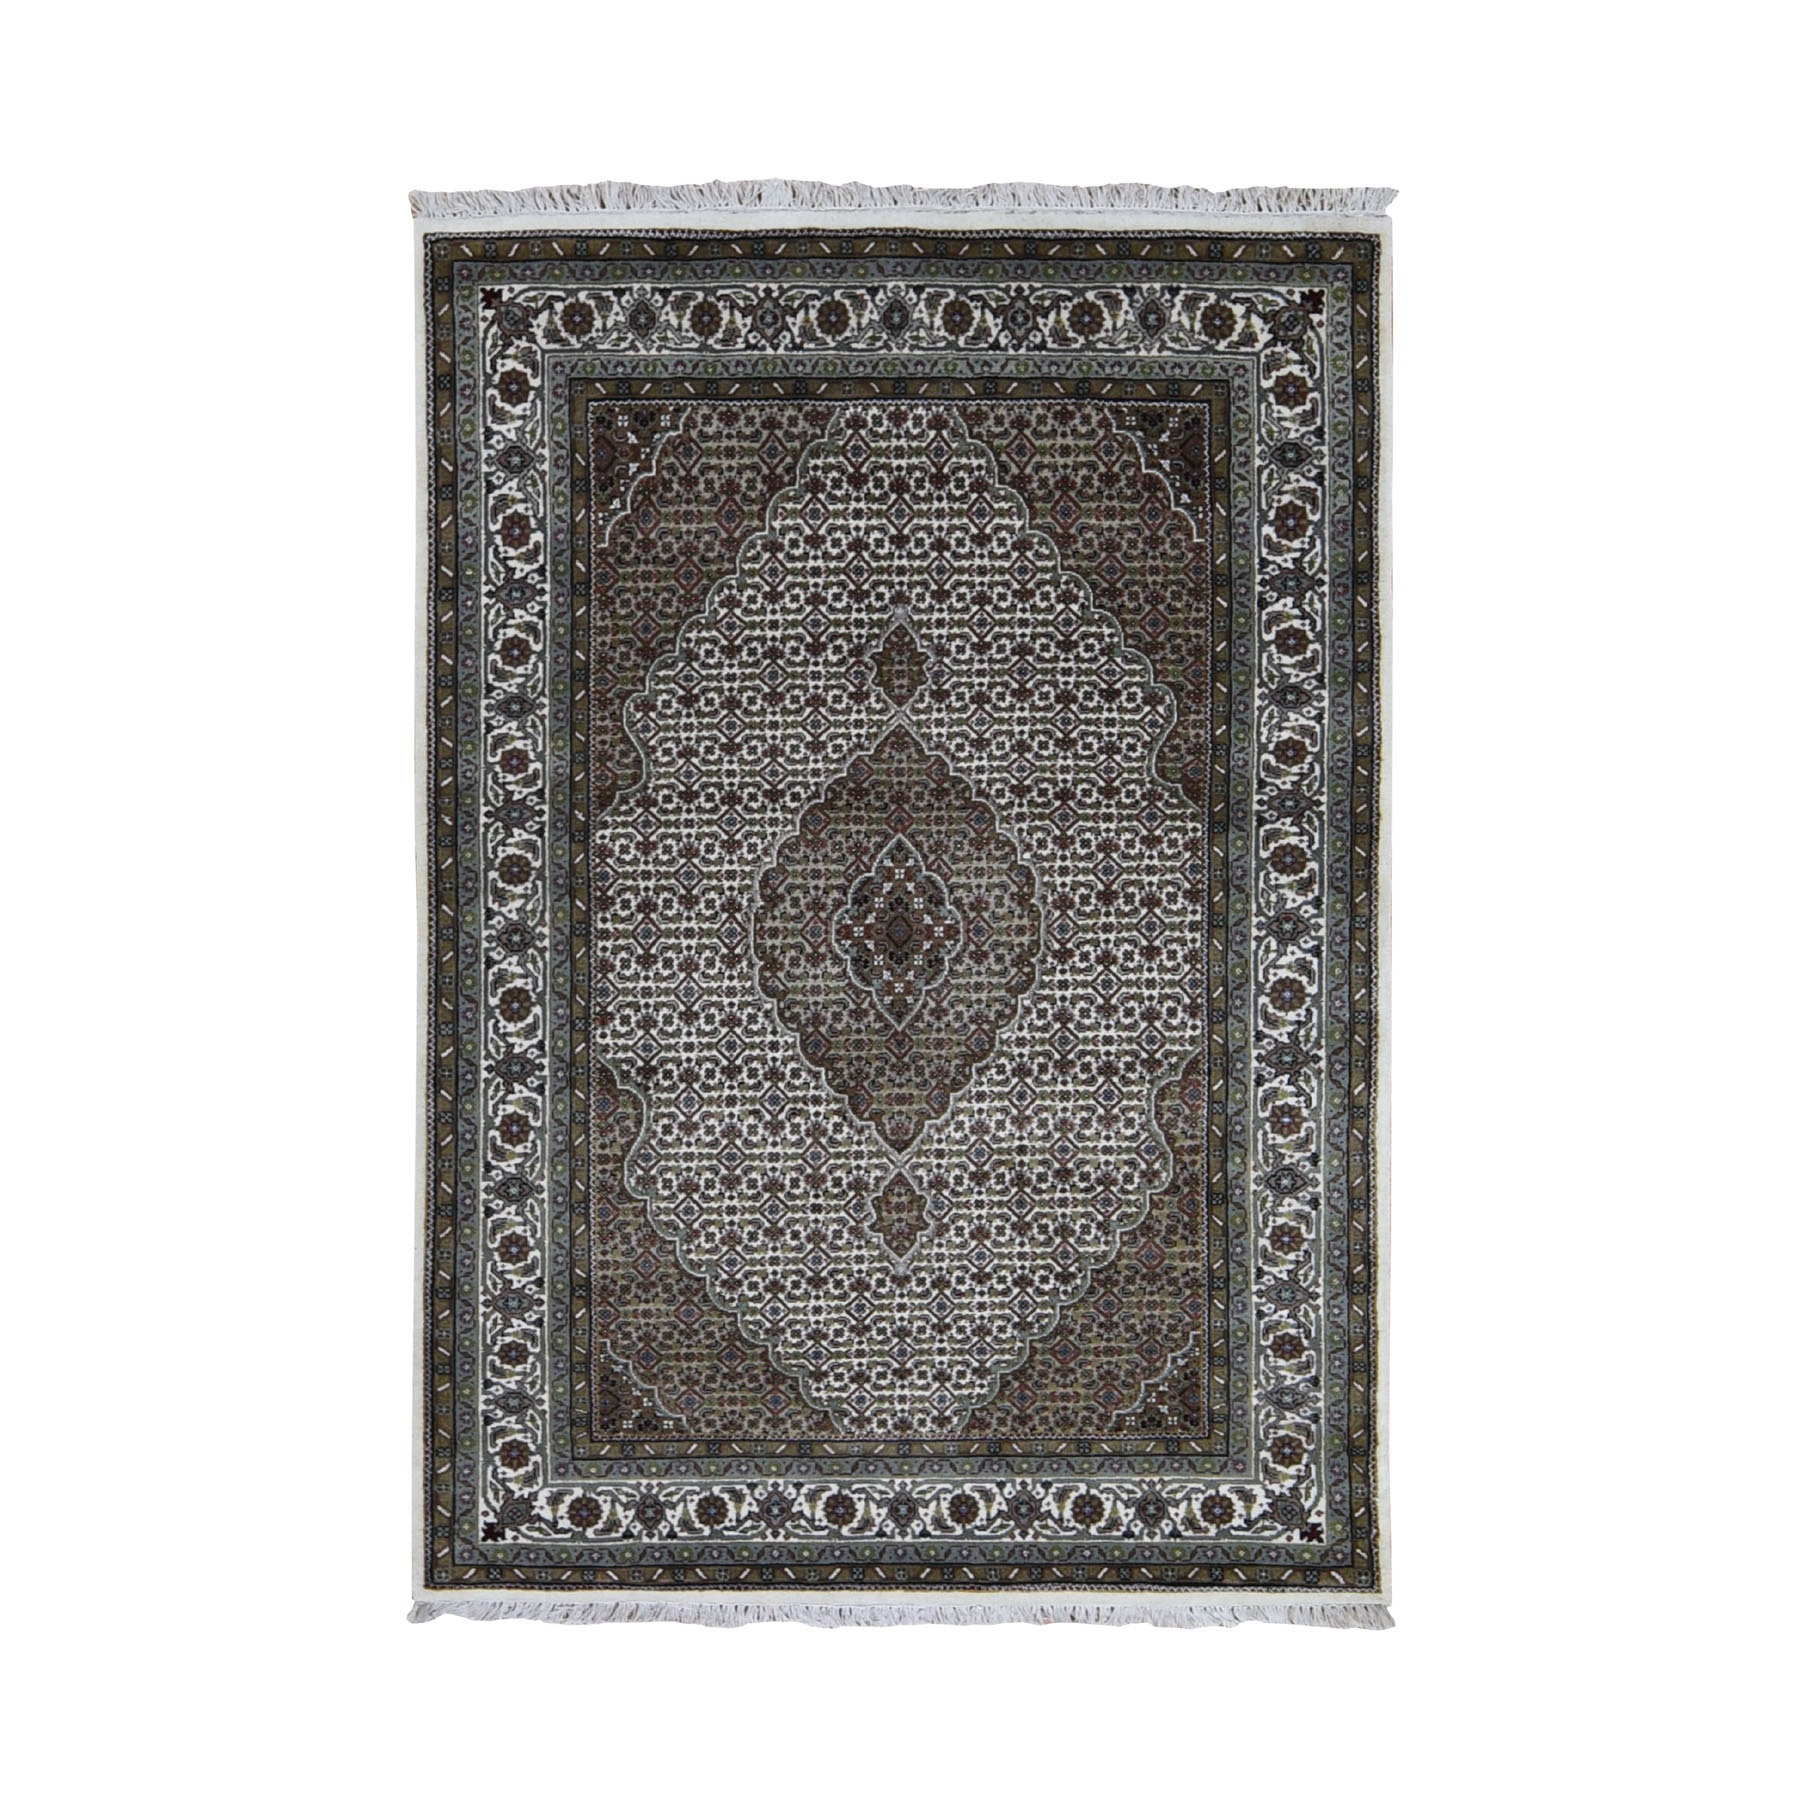 4-7 x6-9  Ivory Wool And Silk Tabriz Mahi Design Hand Knotted Oriental Rug